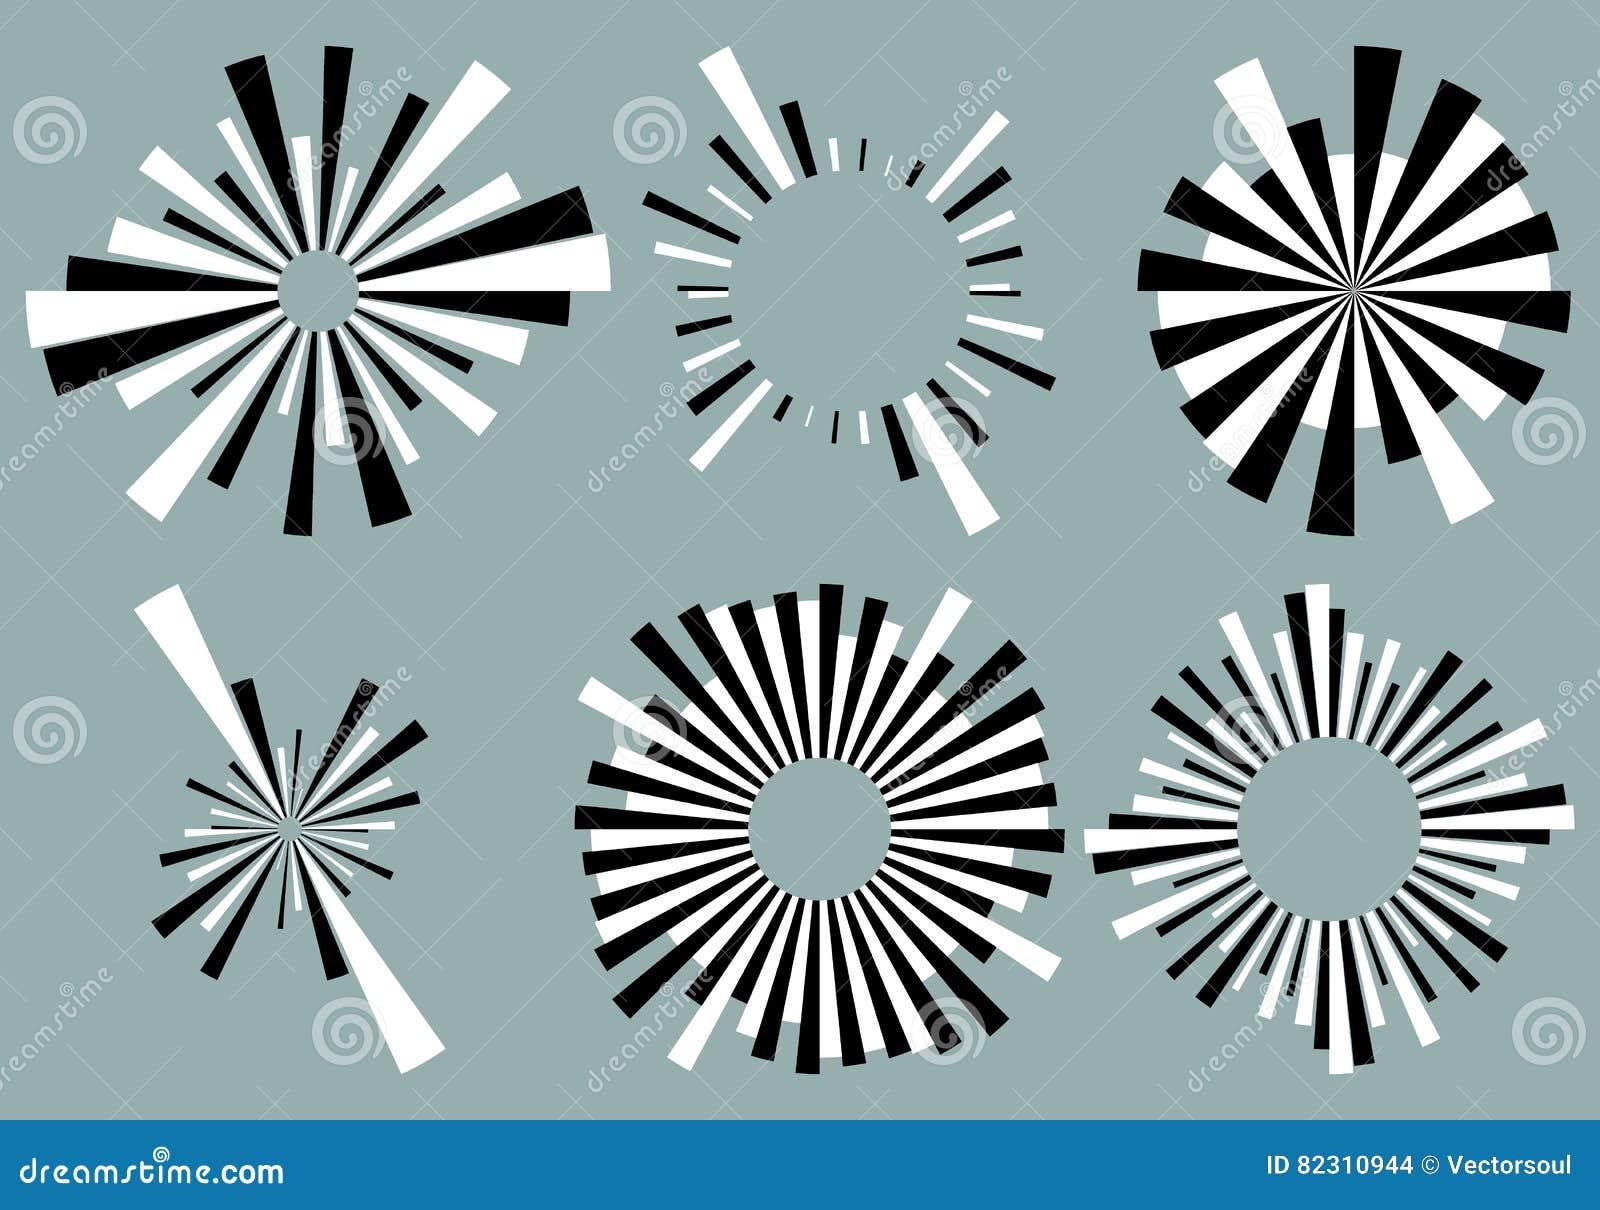 Line Art Of Sun : Set 6 radial lines rays beams elements. various starburst sun